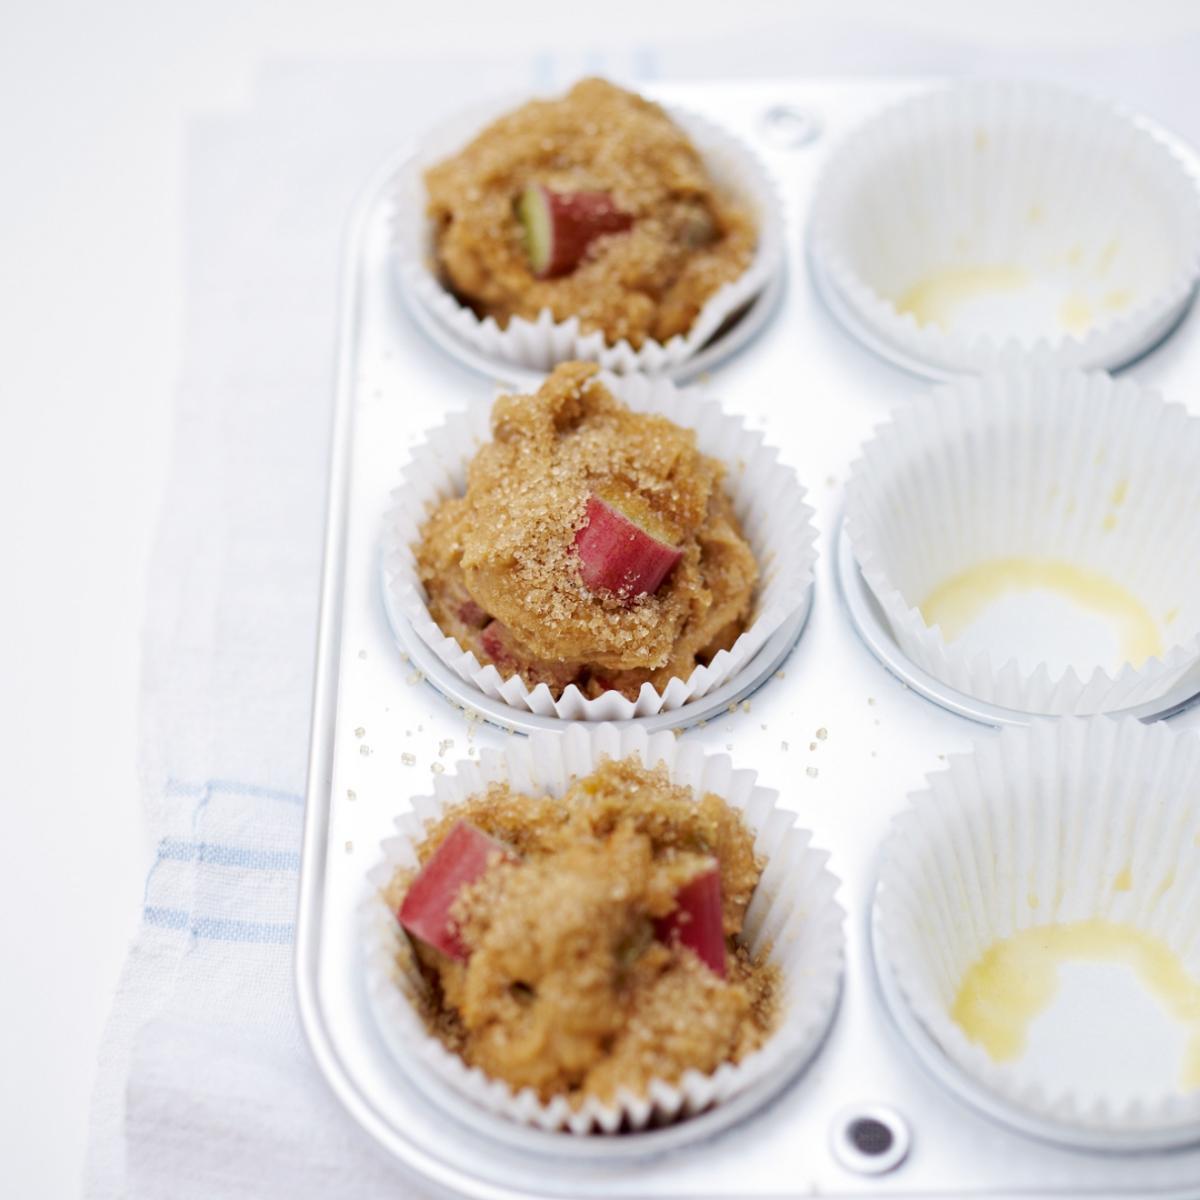 delia 39 s cakes recipes delia online